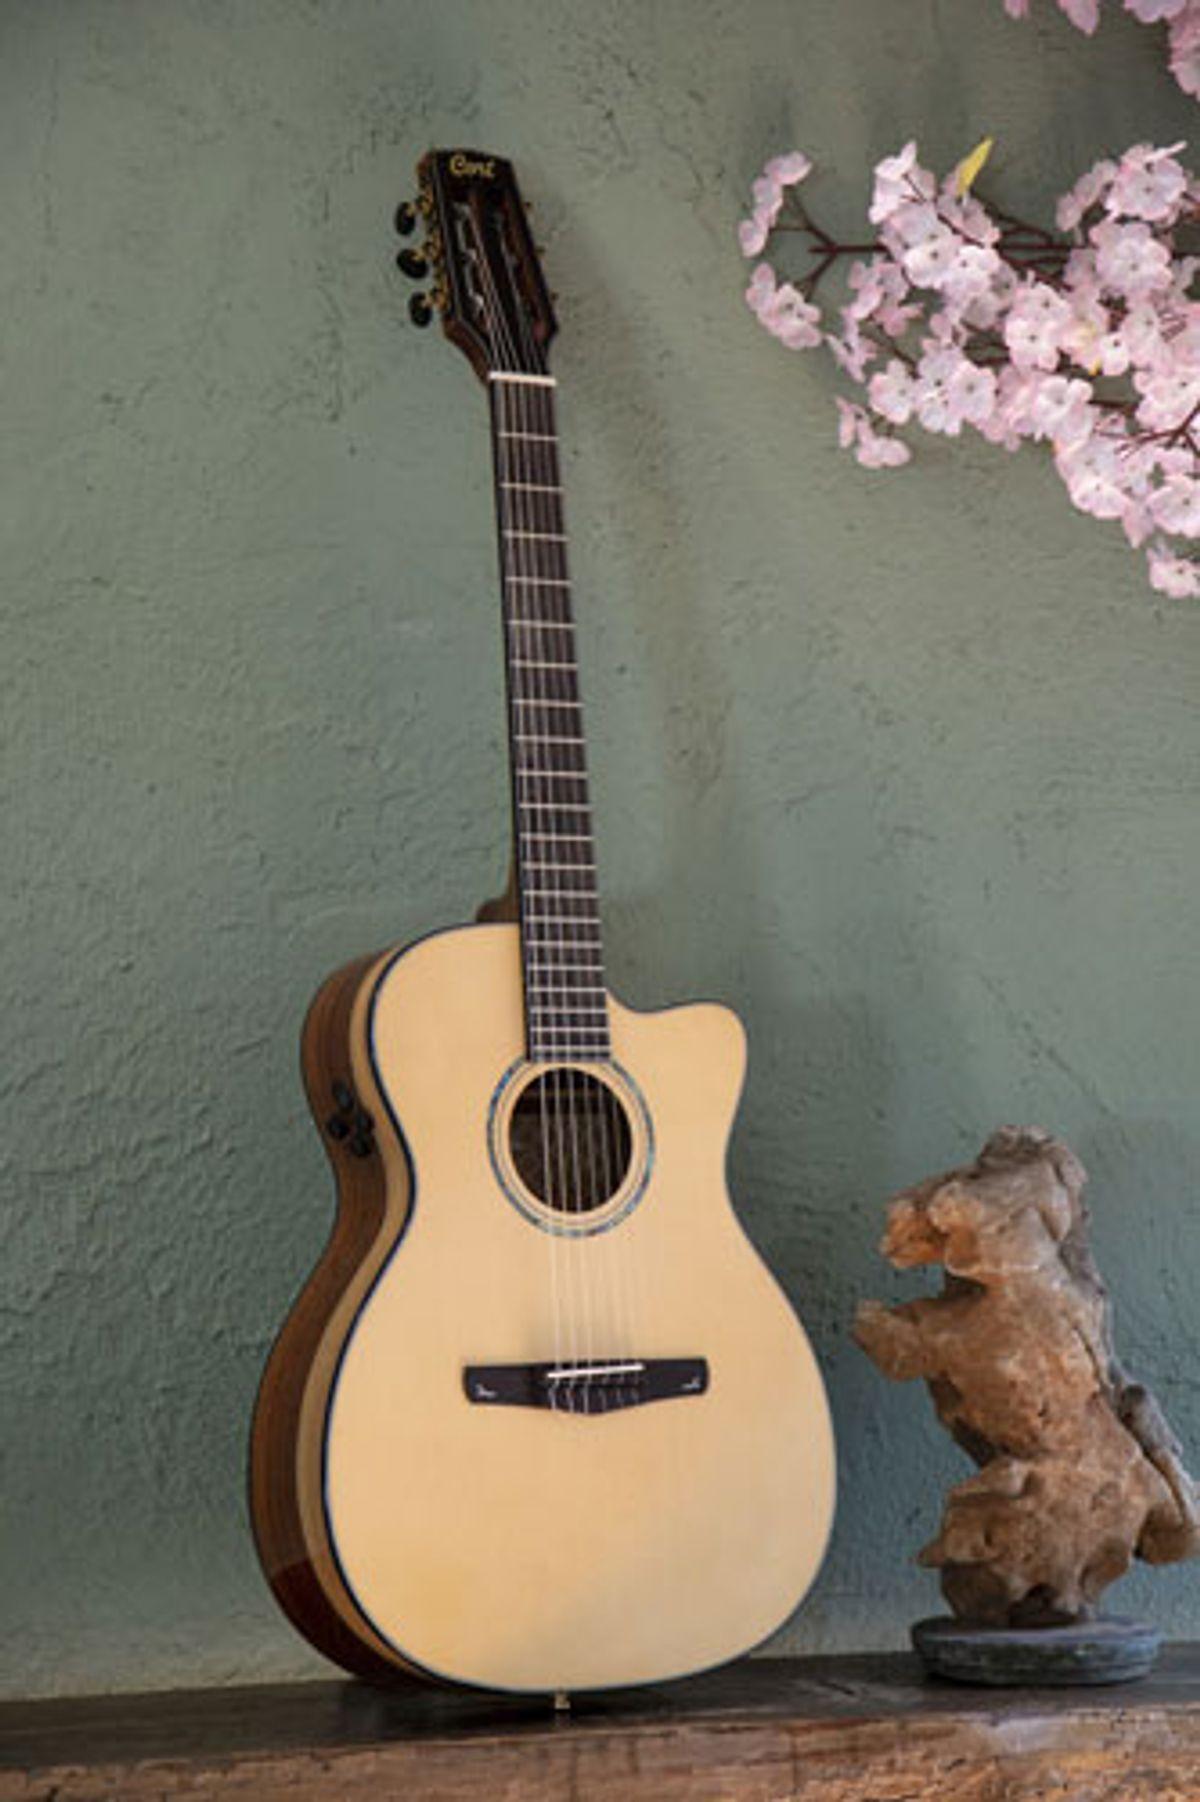 Cort Unveils the Gold-OC8 Nylon Classical Guitar